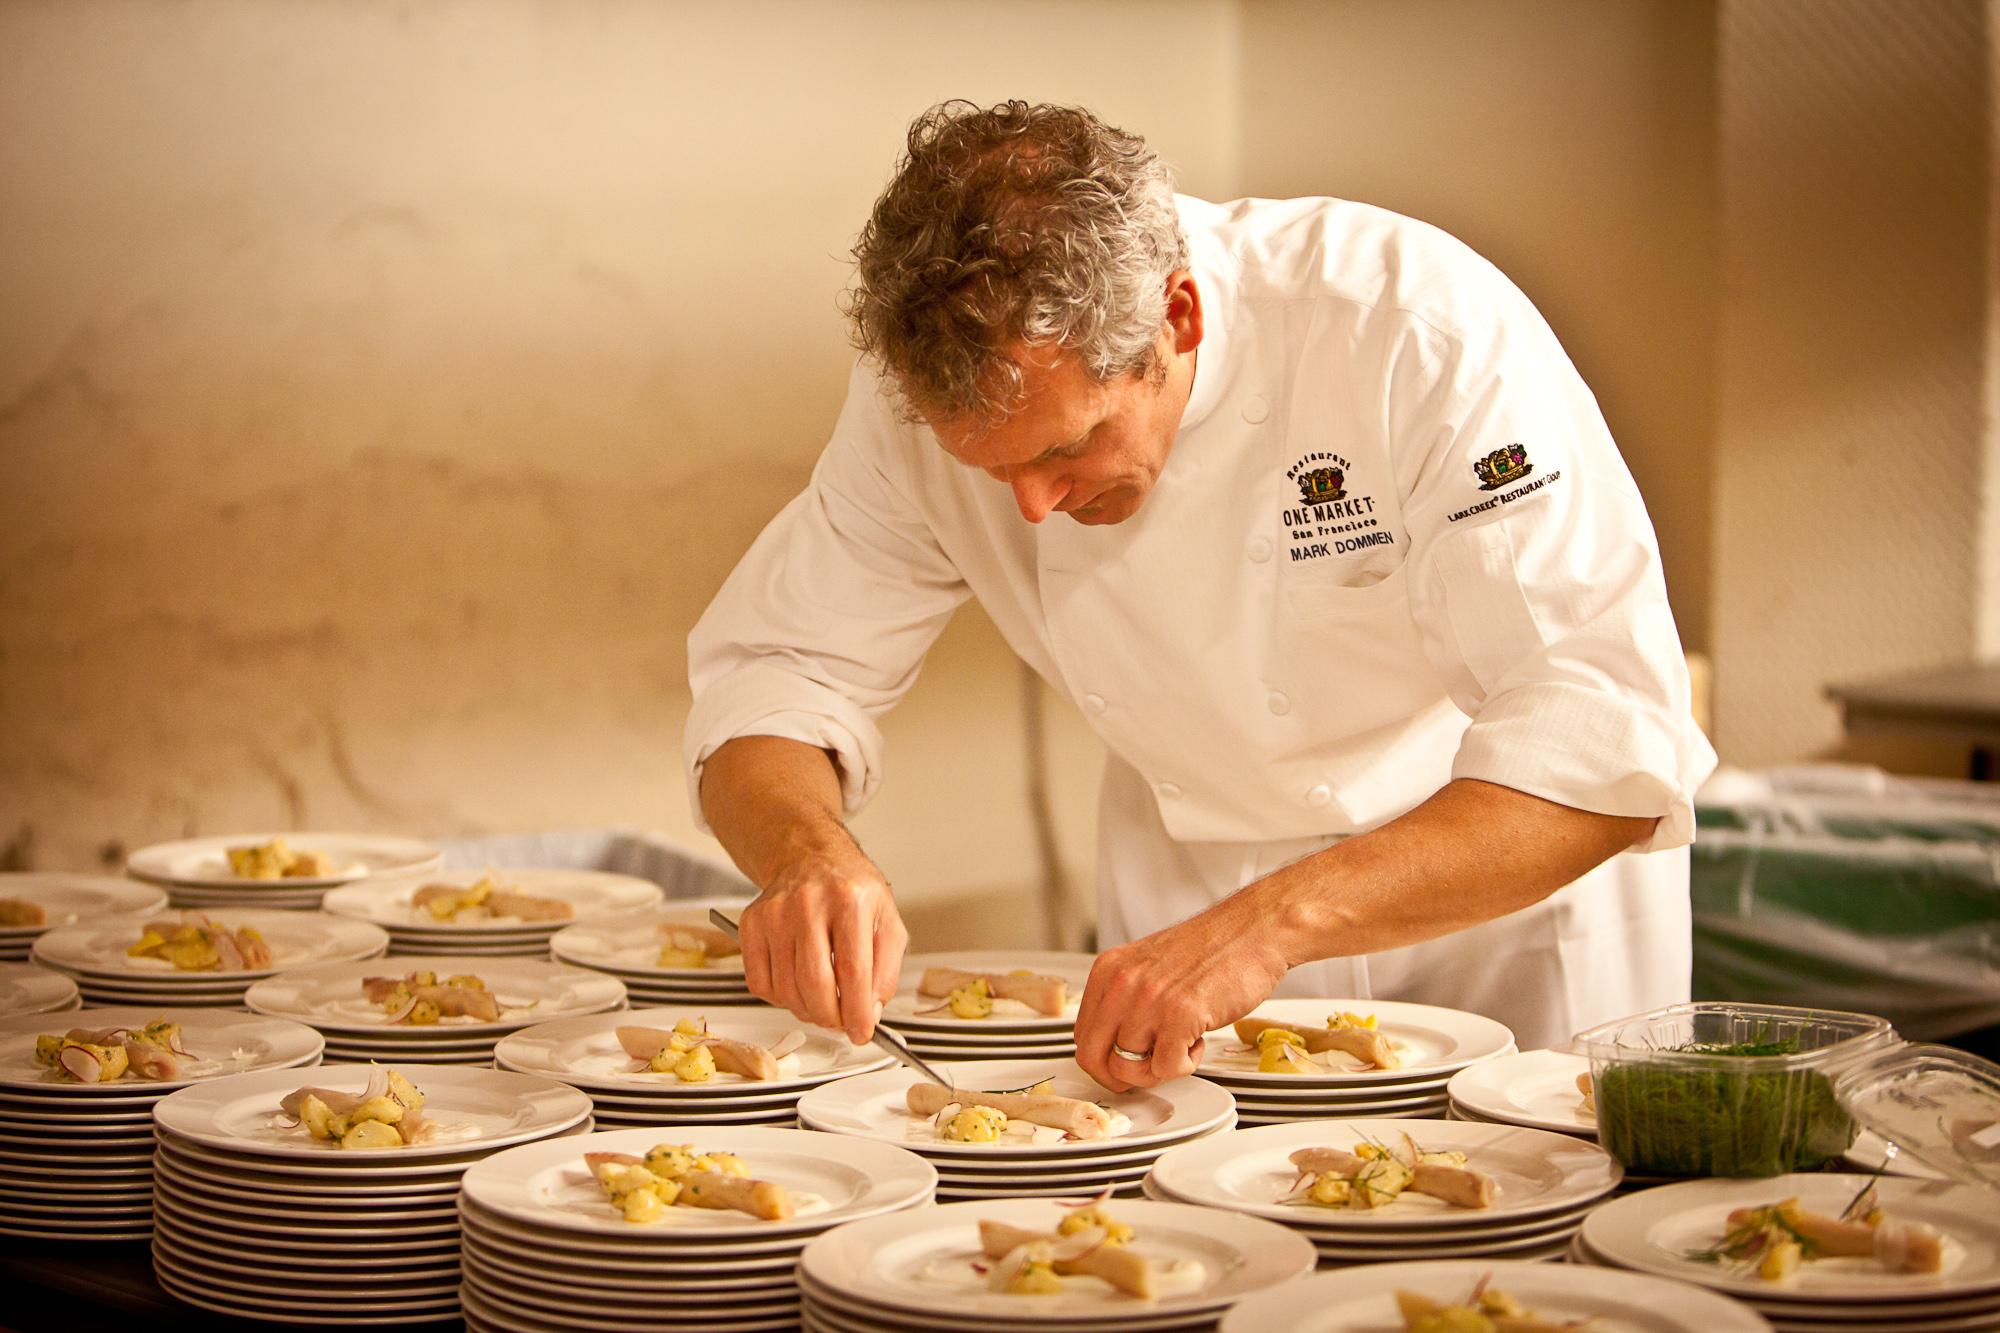 Chef coats - kitchen staff uniforms - executive chef coats and uniforms